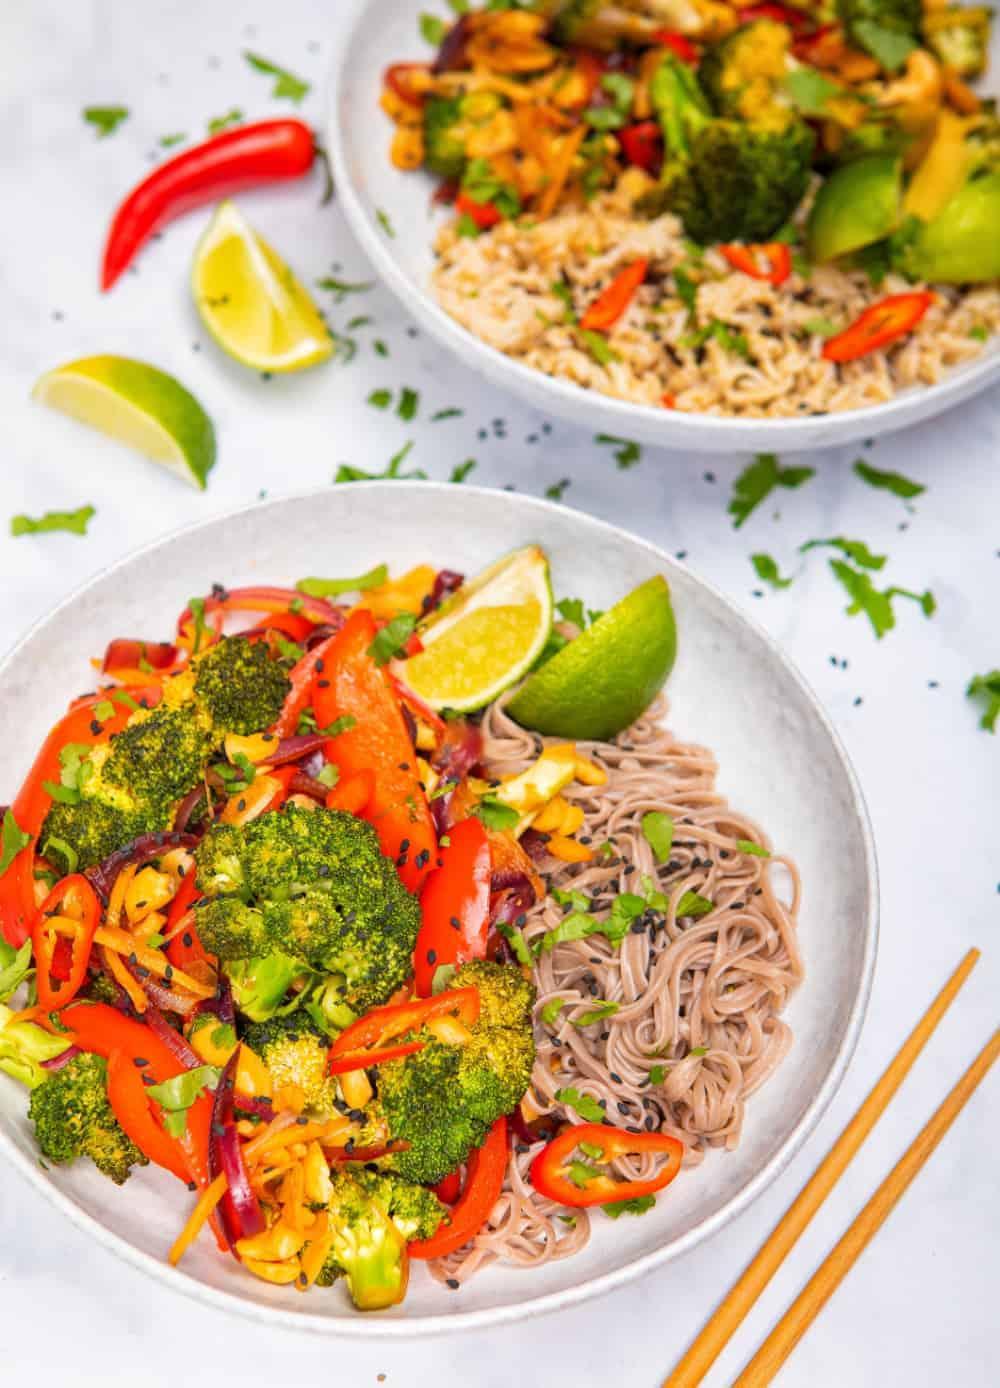 15 Minute Broccoli & Cashew Stir-Fry - front